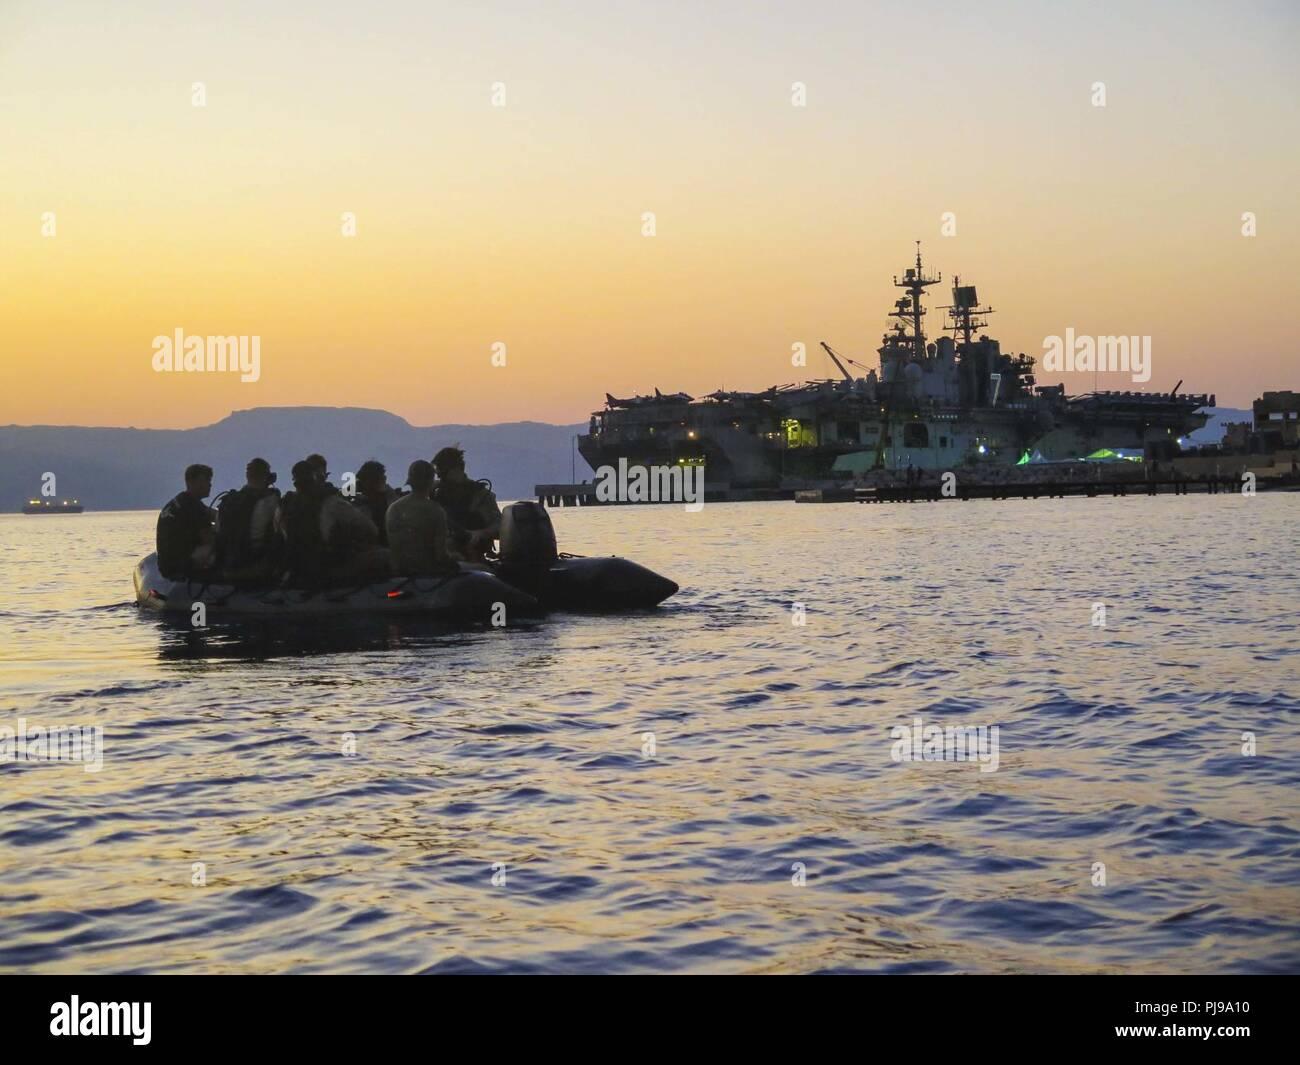 official photos af832 db6a8 AQABA, Jordan (July 8, 2018) U.S. Marines with Maritime Raid Force (